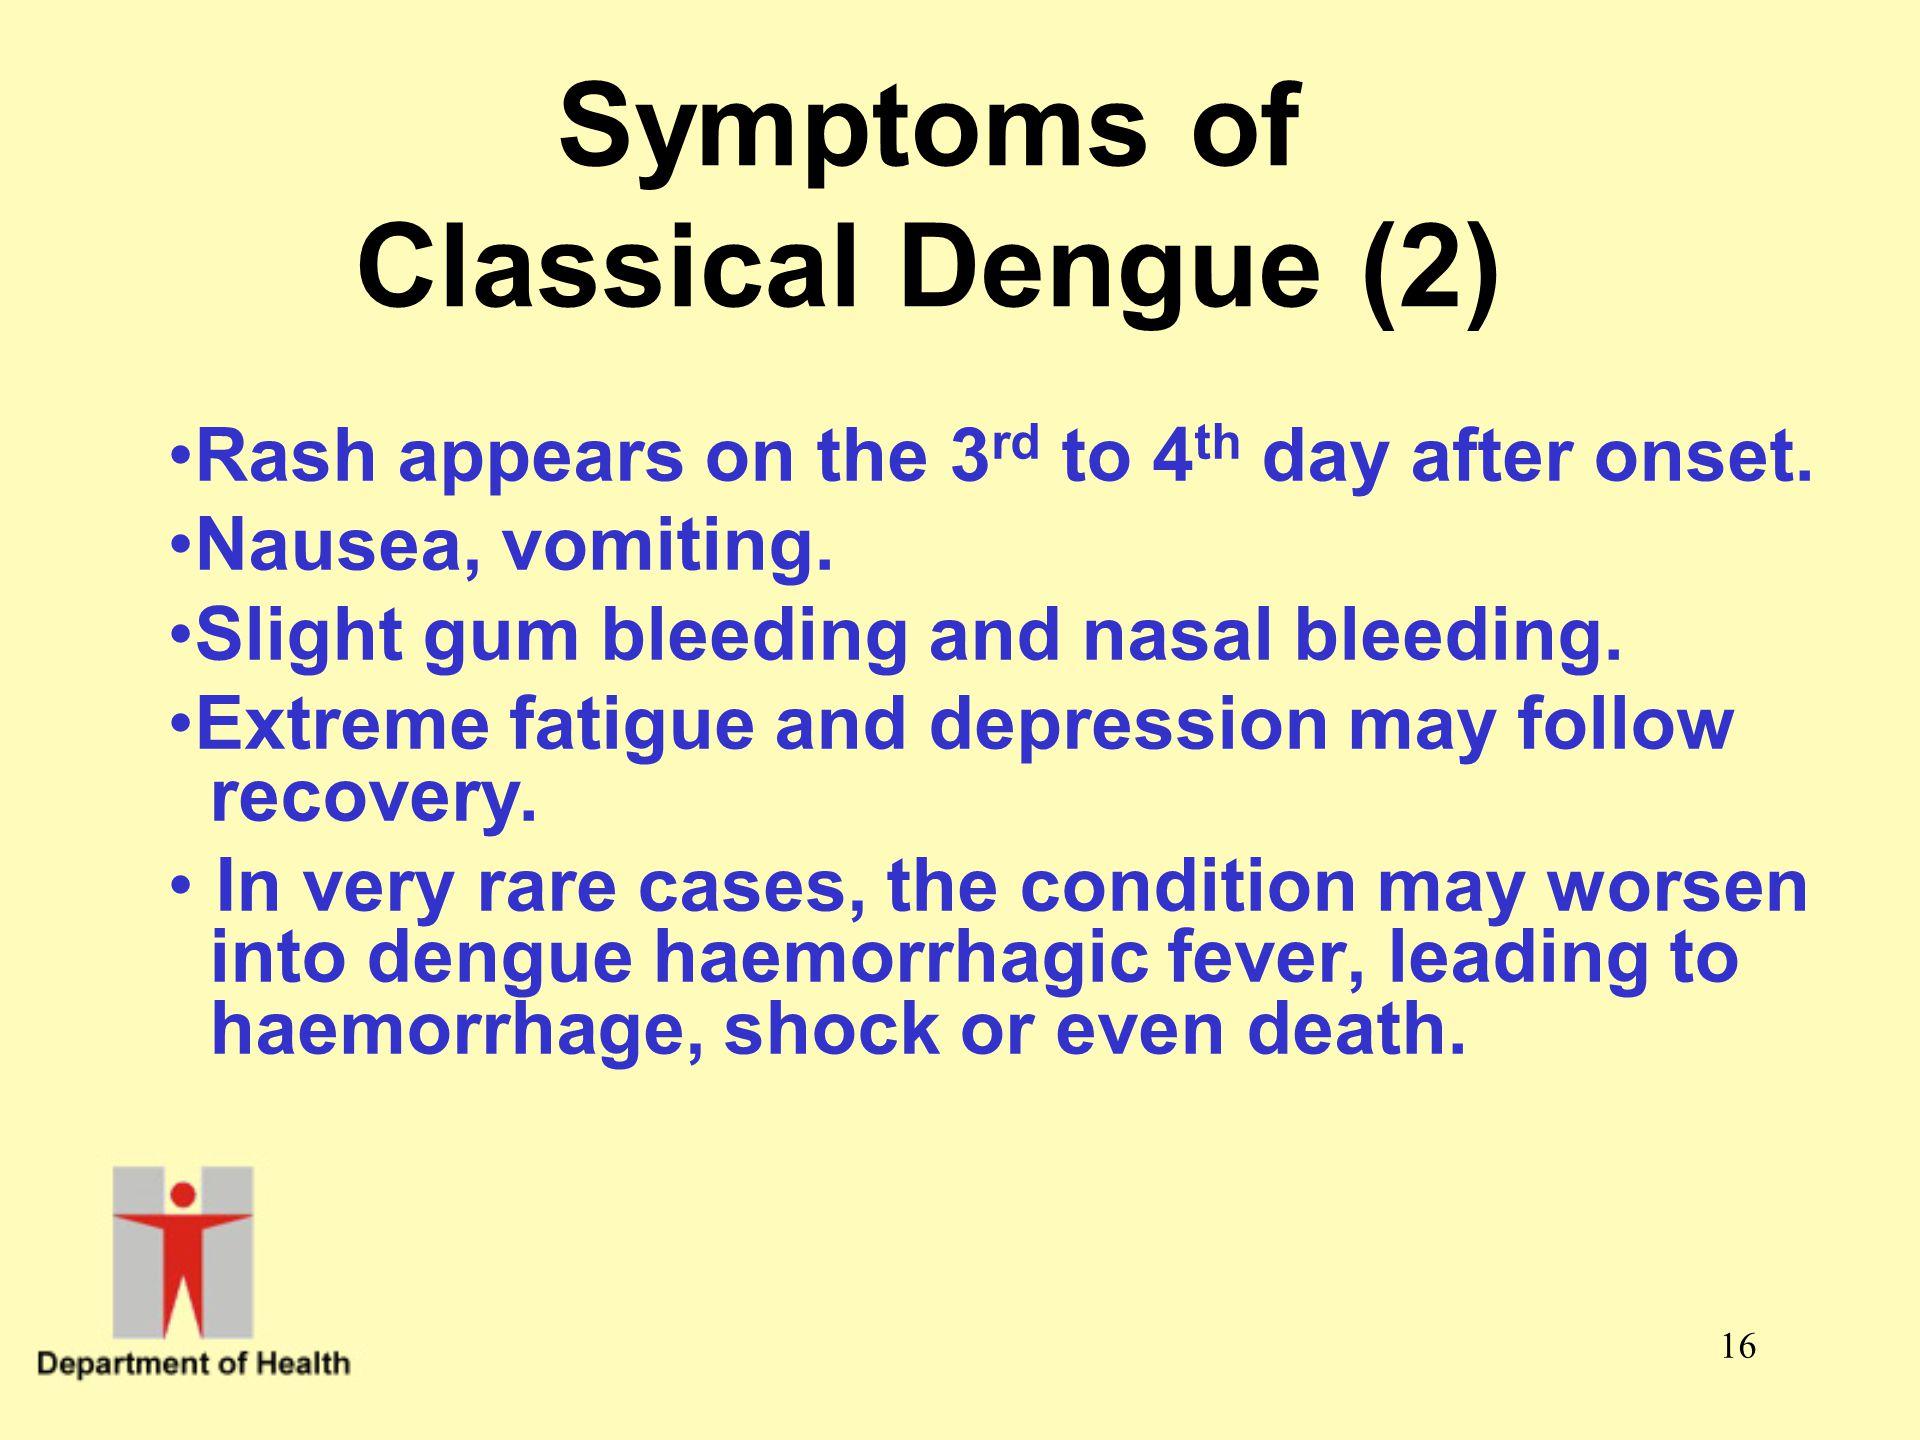 Symptoms of Classical Dengue (2)